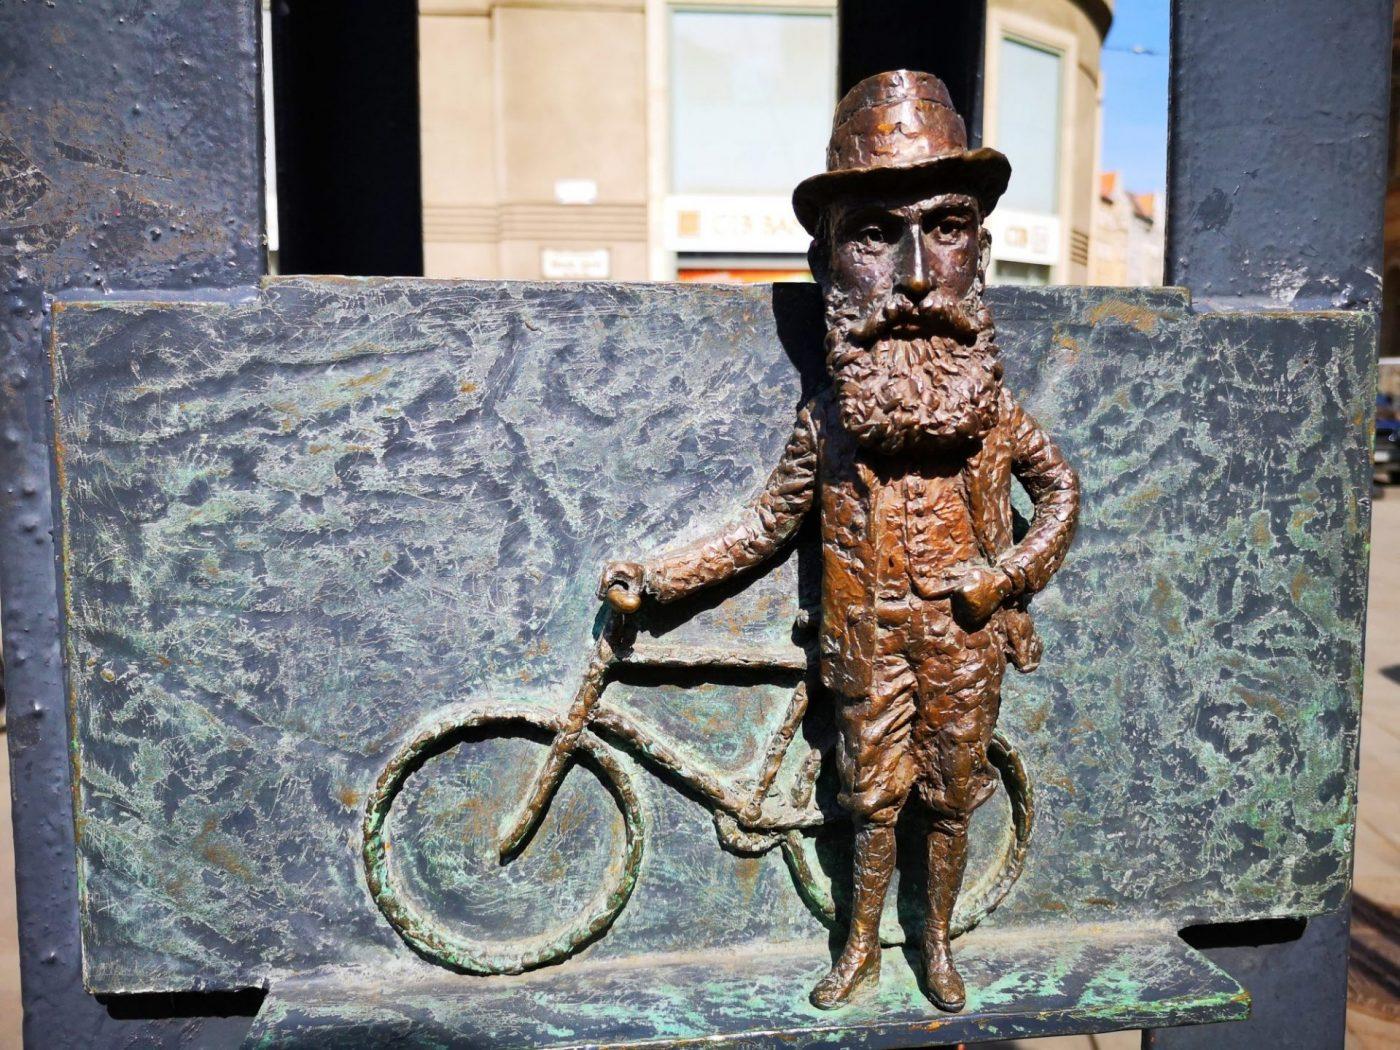 Budapest Street Art & Cultural Walk - Tales of a Backpacker